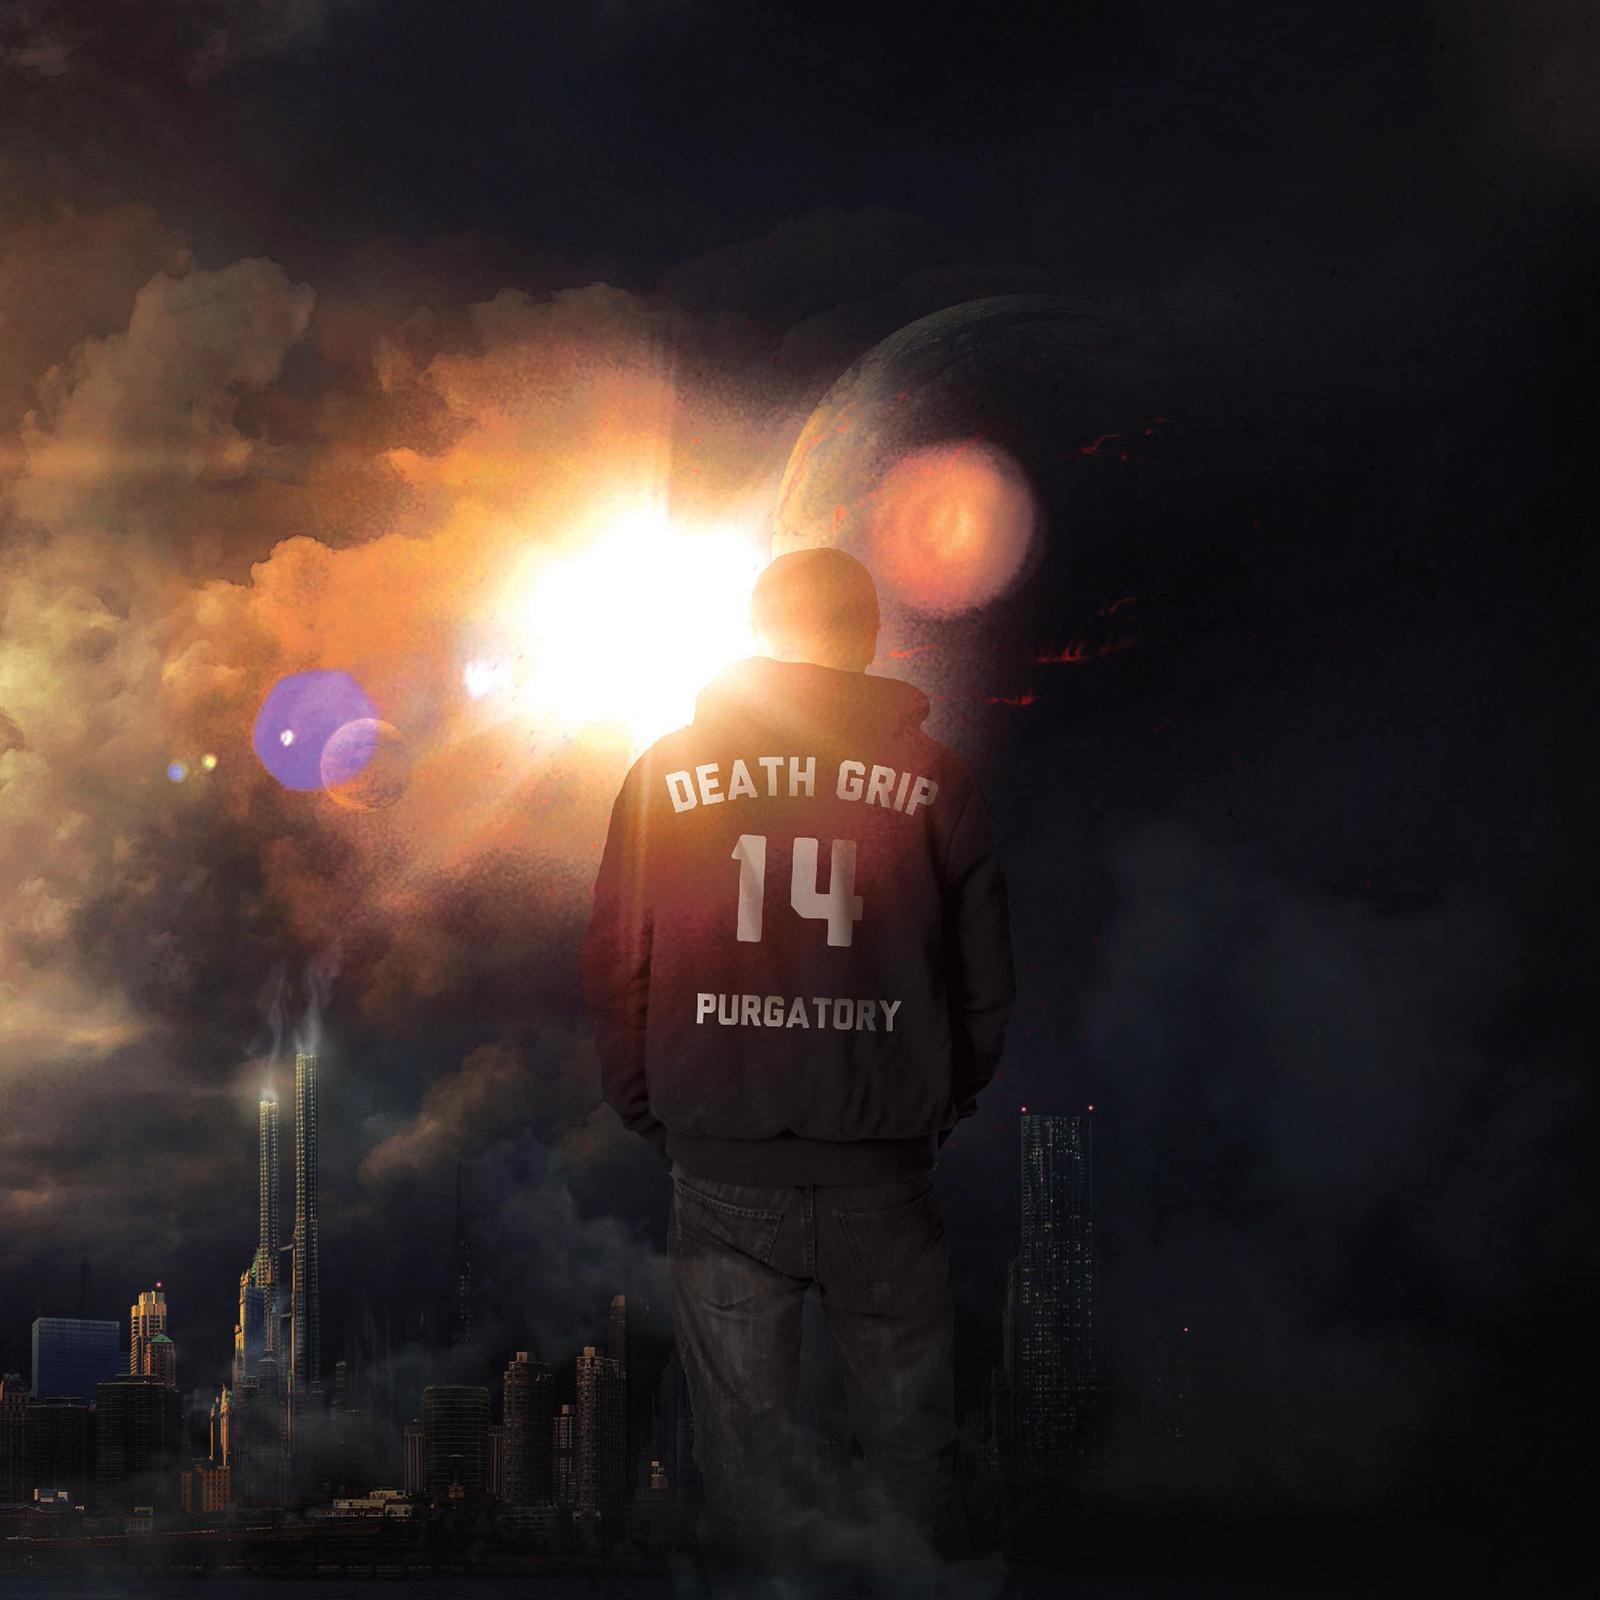 Death Grip - Purgatory - Debut Album Available June 24th 2014